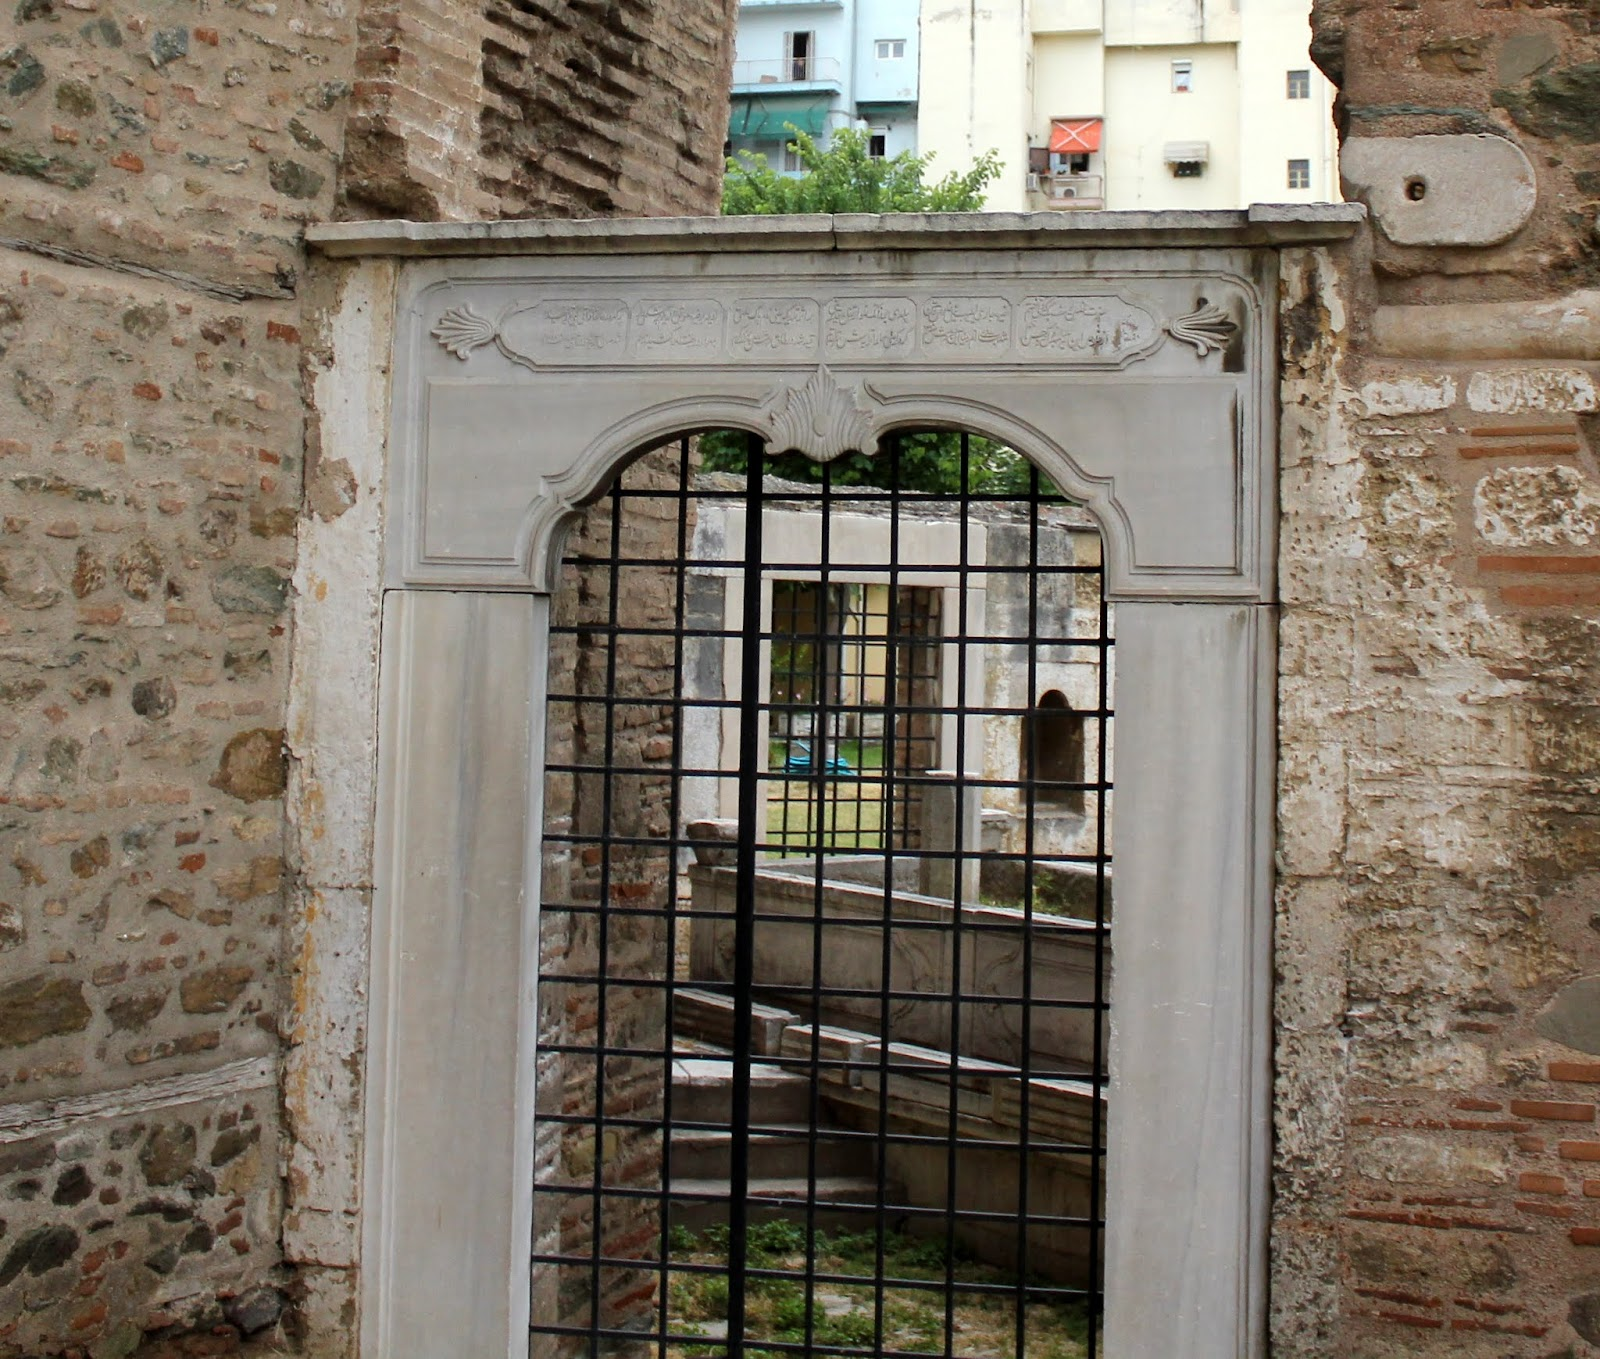 Day 19 - 2013-06-12 - Thessaloniki - IMG_0327.JPG